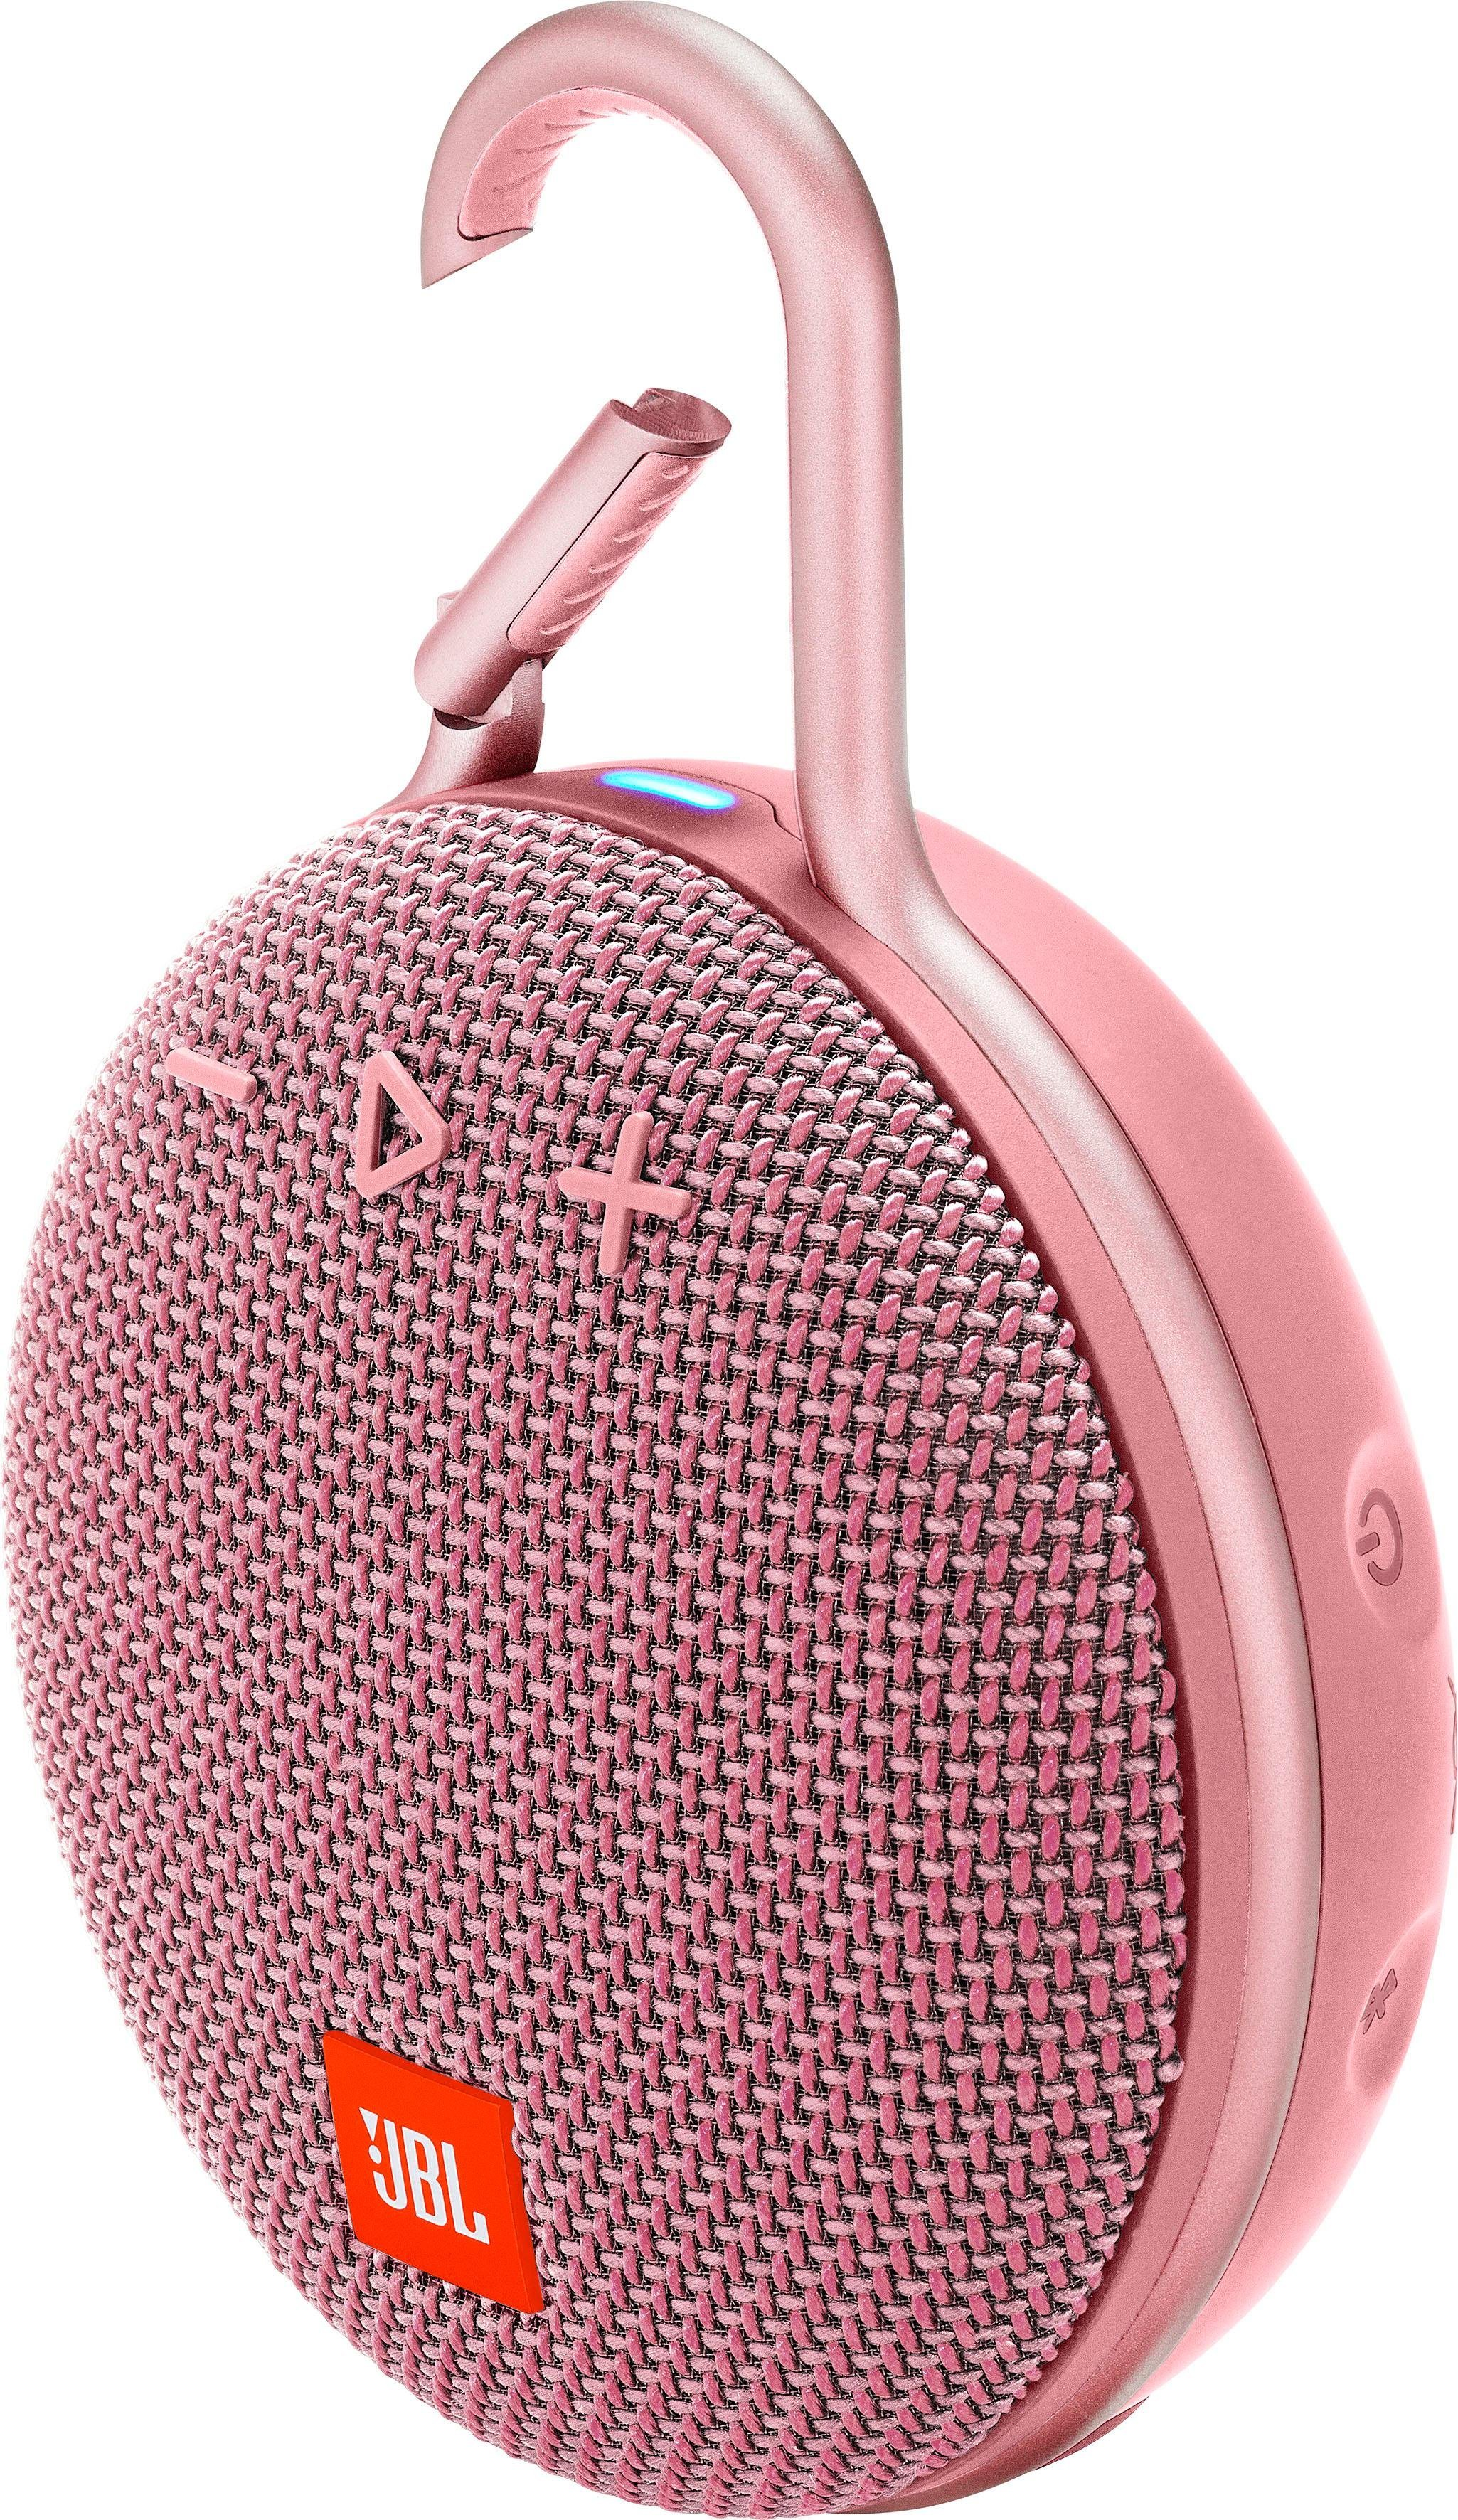 CLIP 3 Portable-Lautsprecher (Bluetooth, Freisprechfunktion, Mikrofon, 3 W)